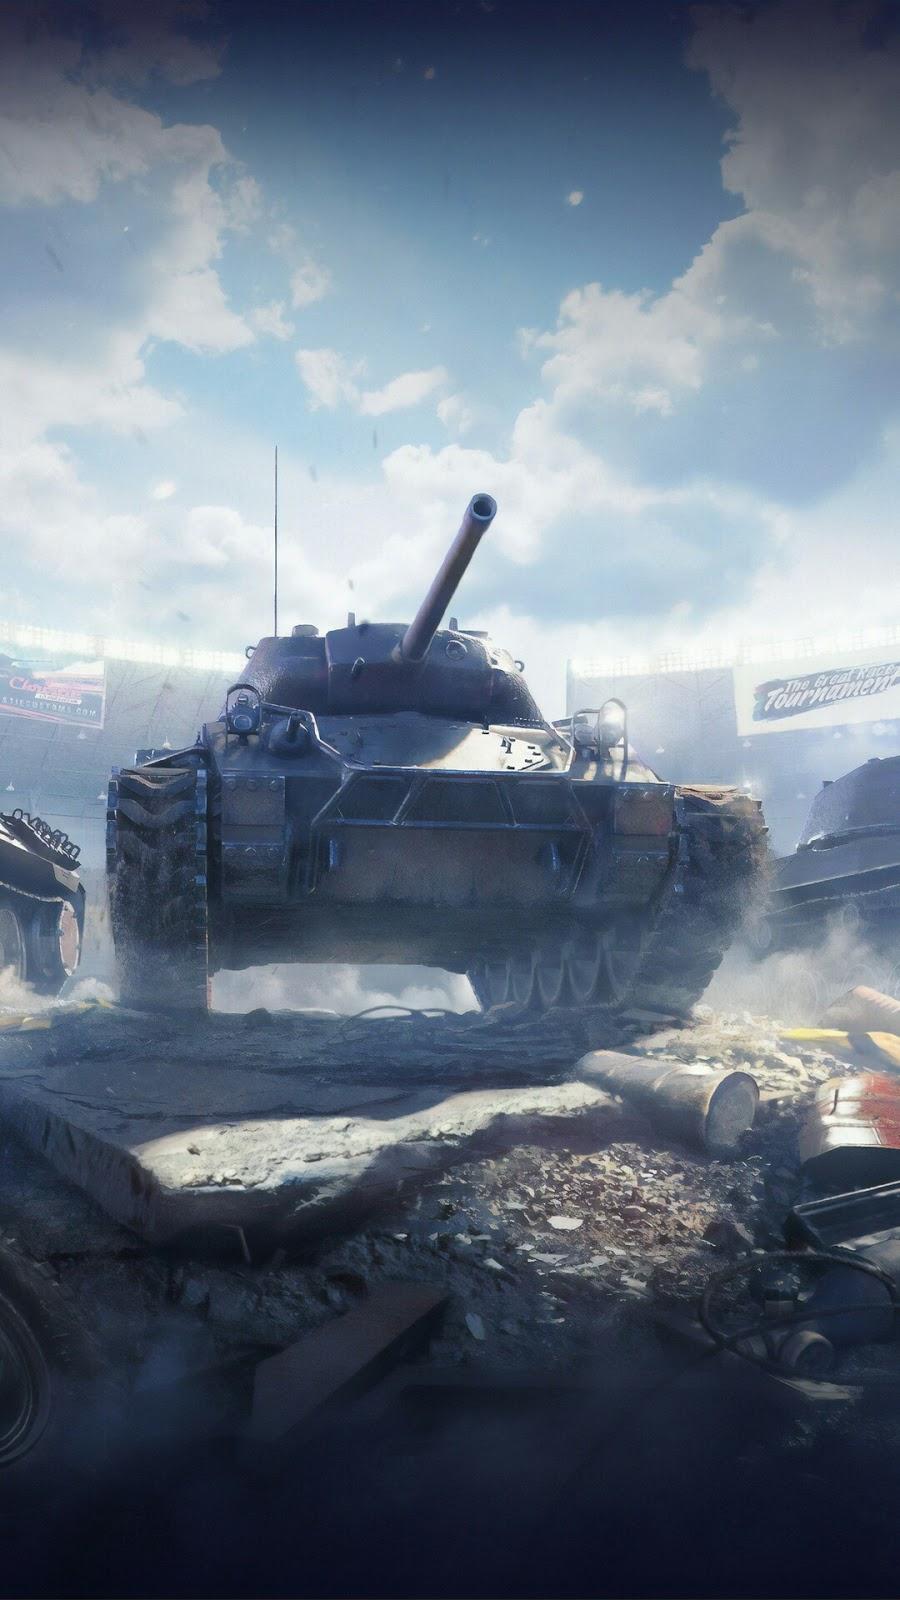 Papel de Parede Tank de Guerra Russo, hd, 4k.